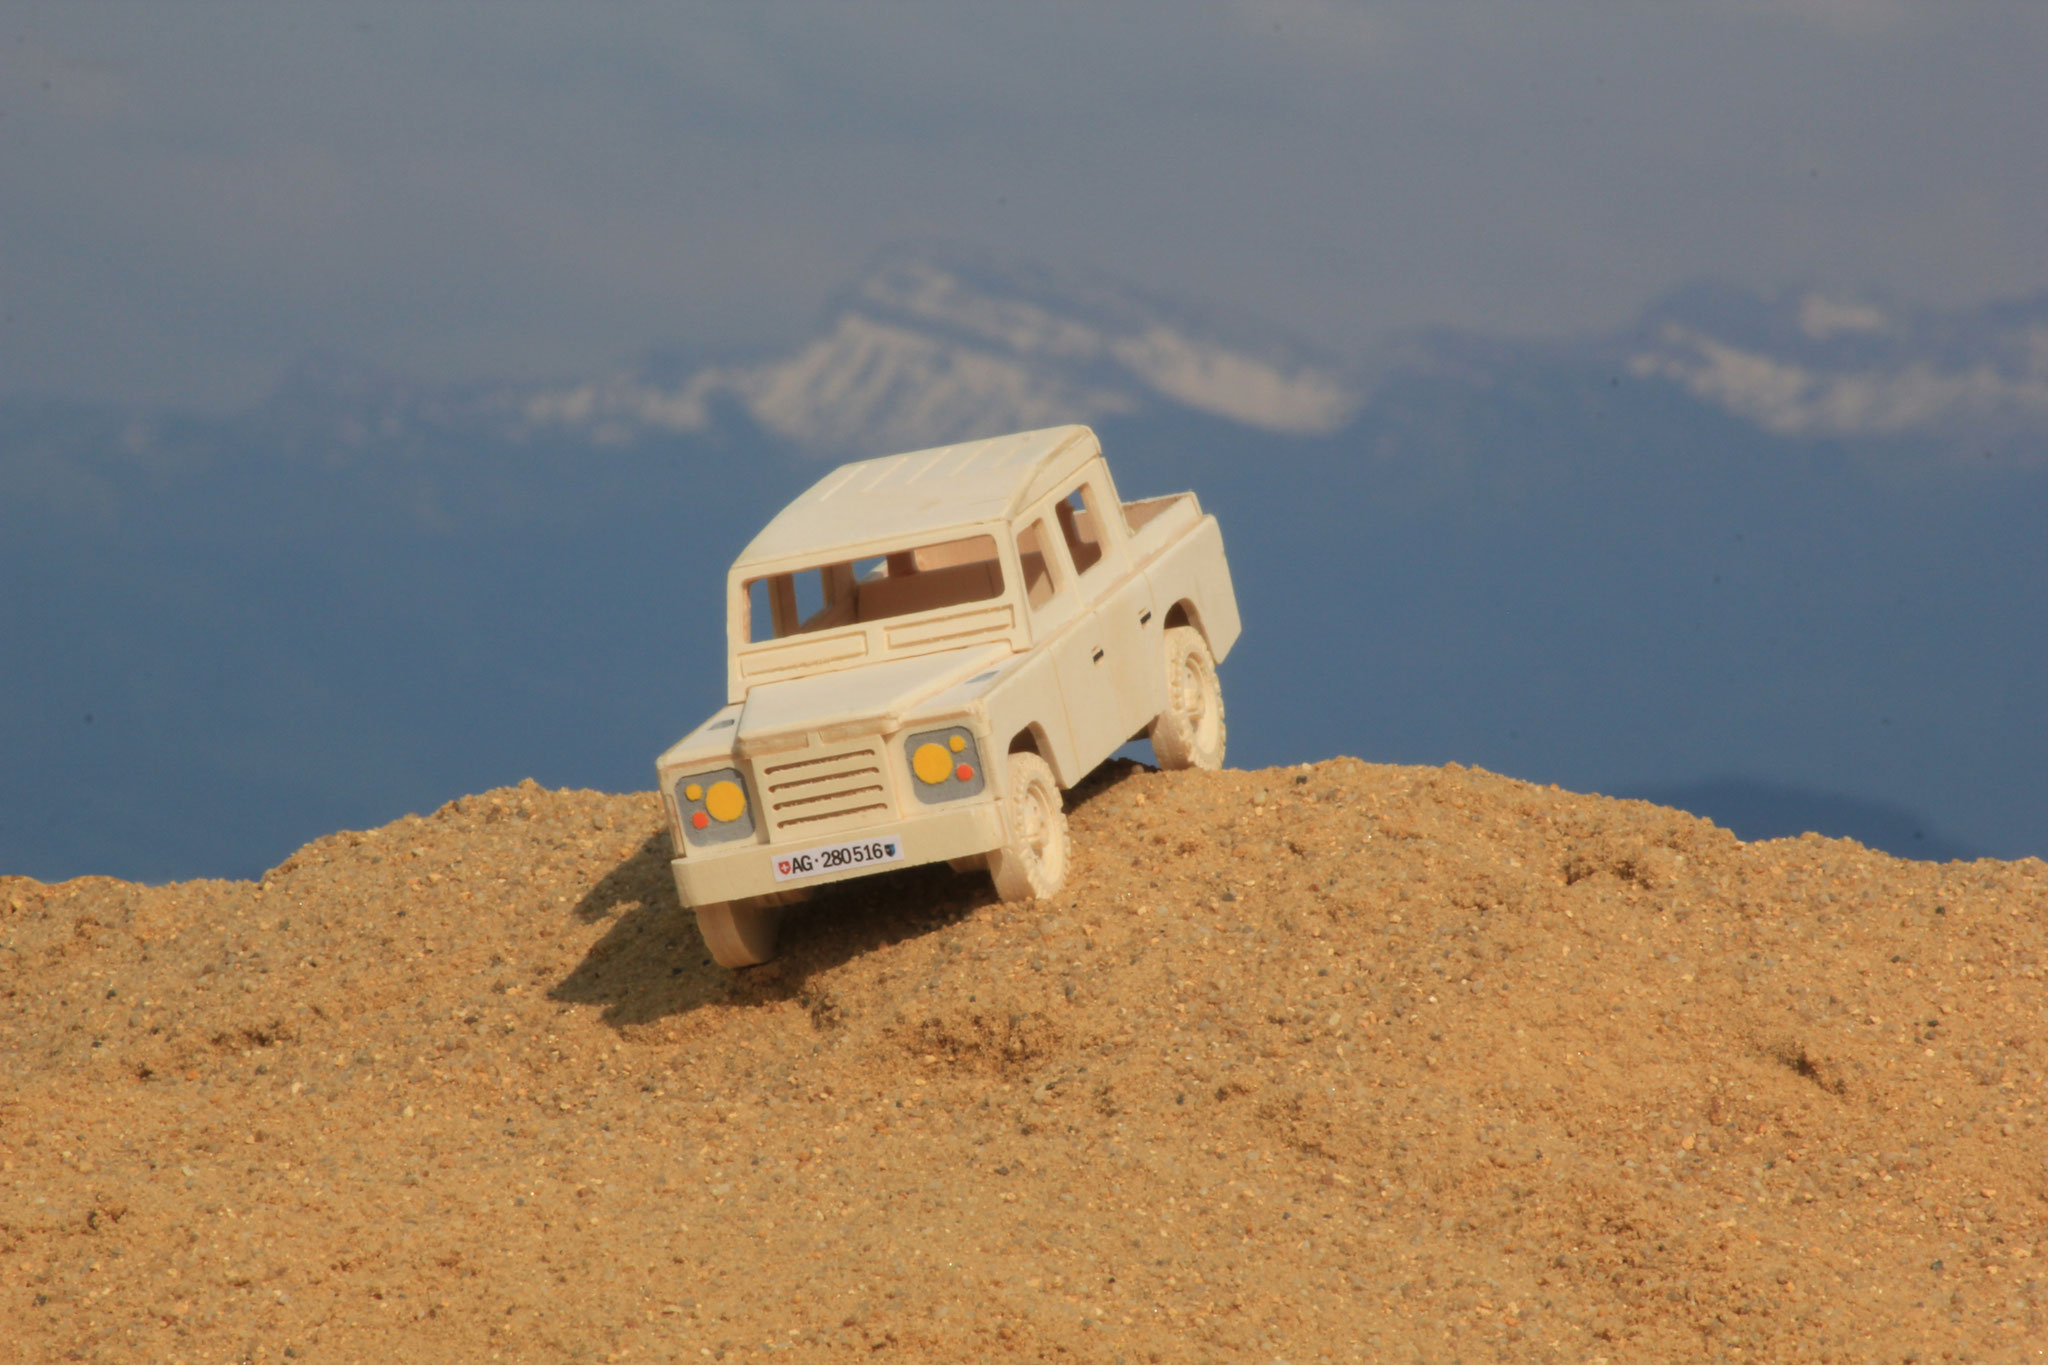 Start holzlandy land rover modelle aus holz